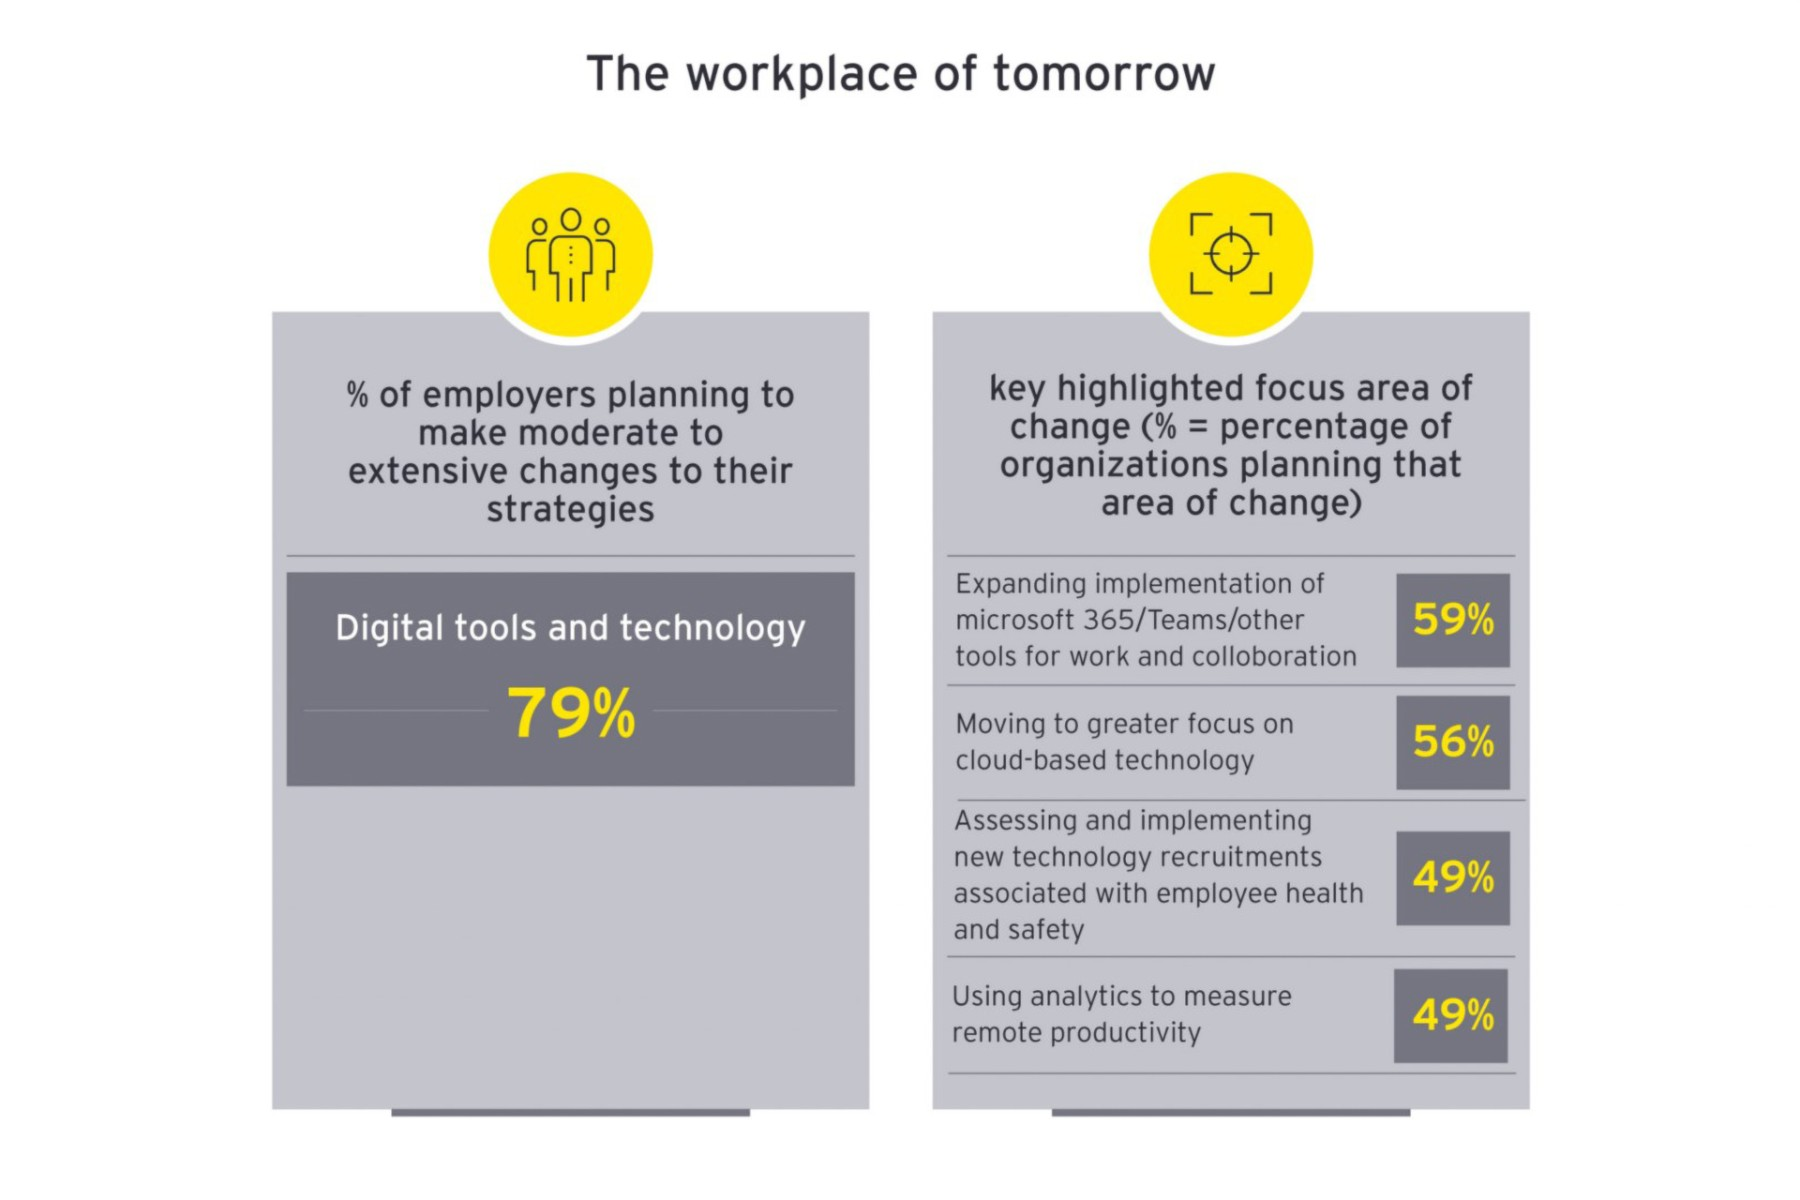 ey-article-work-reimagined-reimagining-the-digital-workplace-kuva2.jpg.rendition.1800.1200